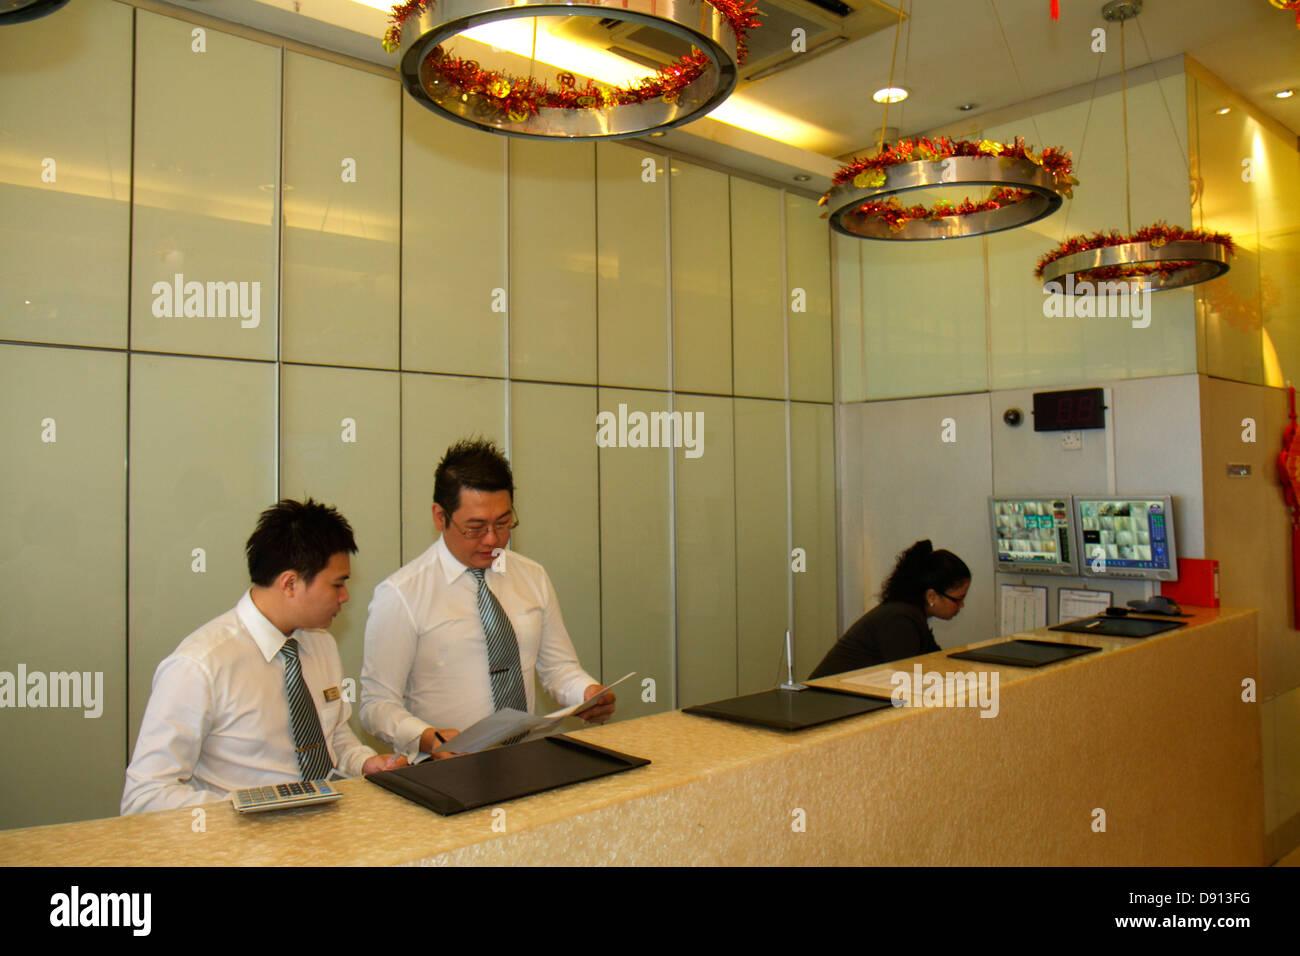 Singapore Jalan Besar Hotel 81 Lobby Front Desk Asian Man Woman Job Service  Inside Interior Budget Hotel